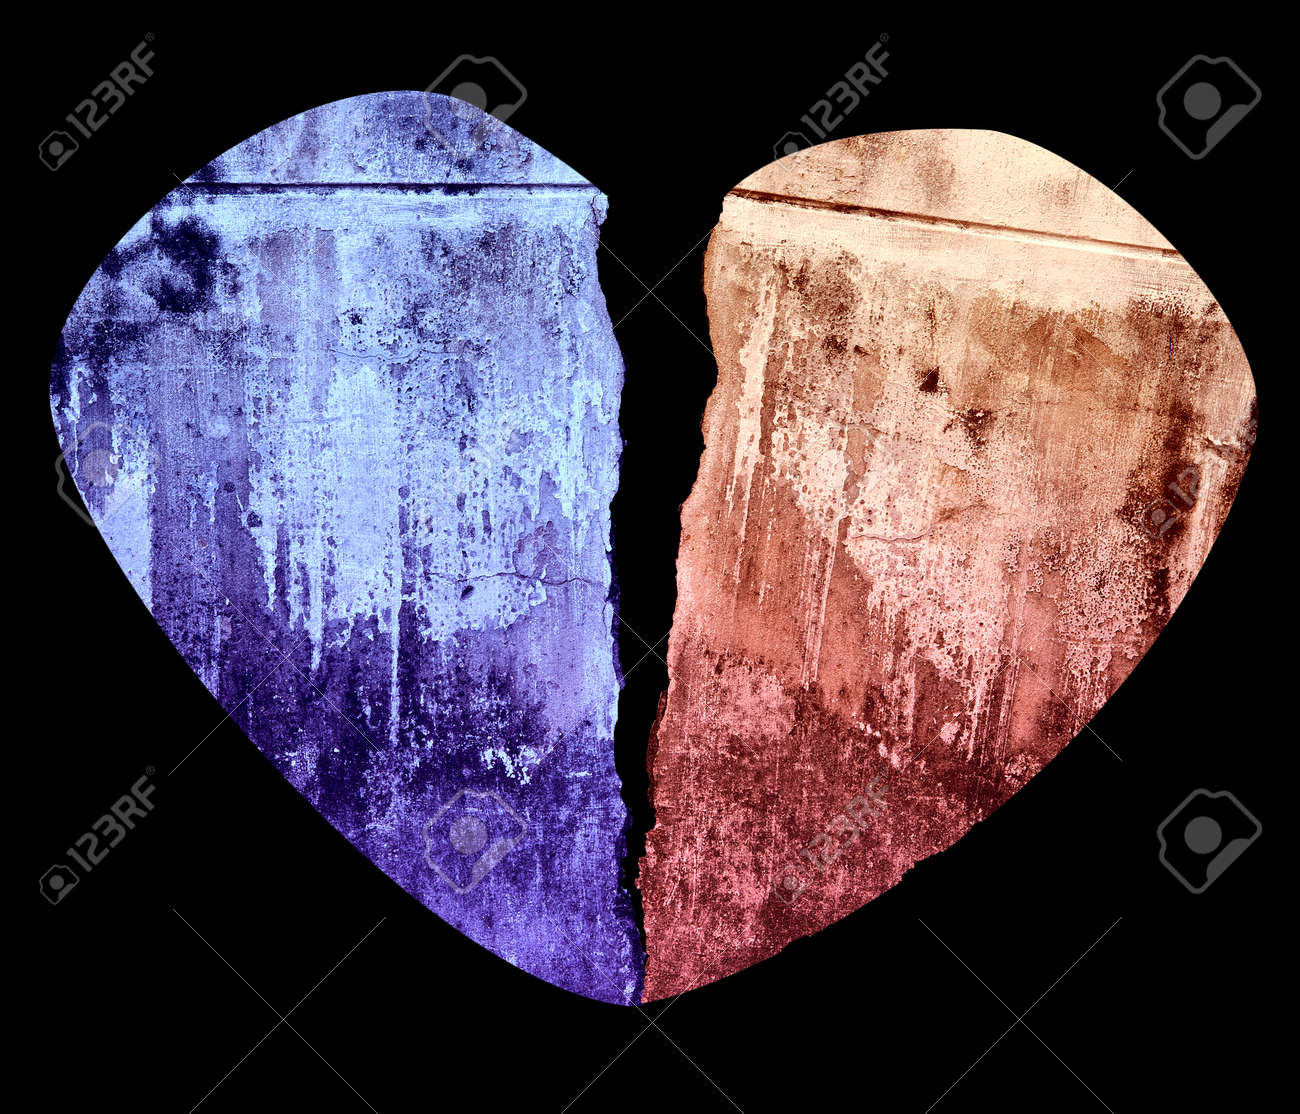 Broken Heart Grunge Crack Style Illustration Isolated on Black Stock Illustration - 17379413